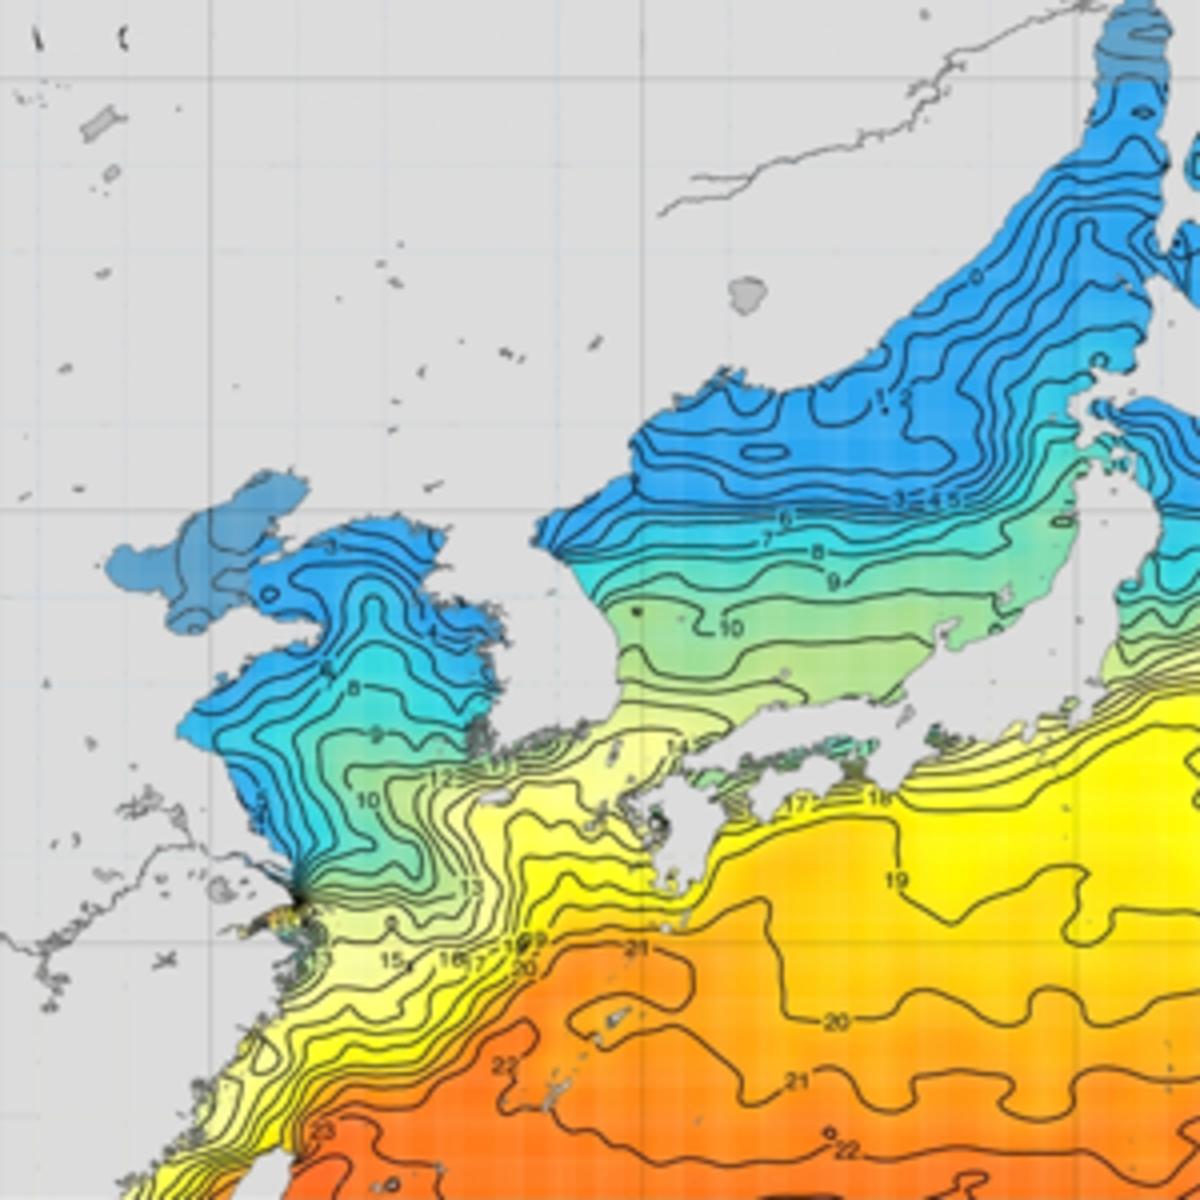 East Asian Seas